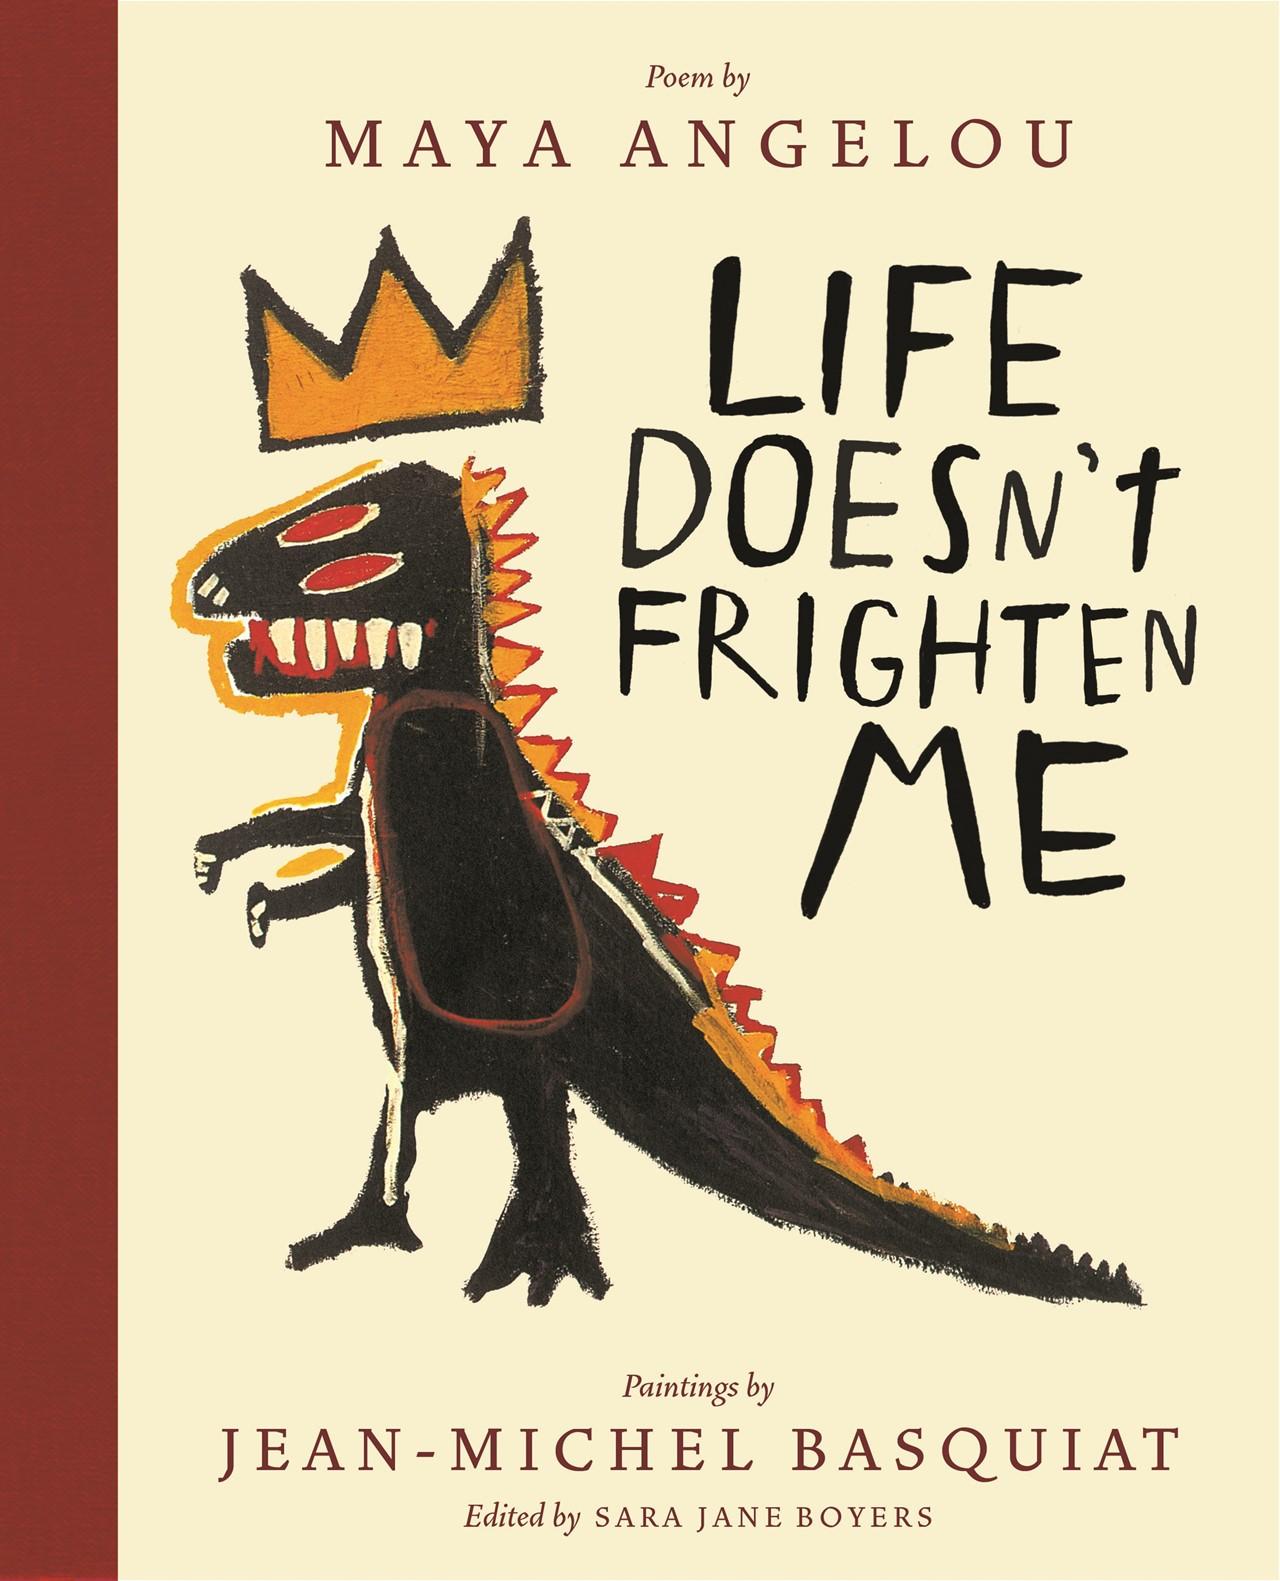 Life Doesn't Frighten Me by Maya Angelou & Jean-Michel Basquiat